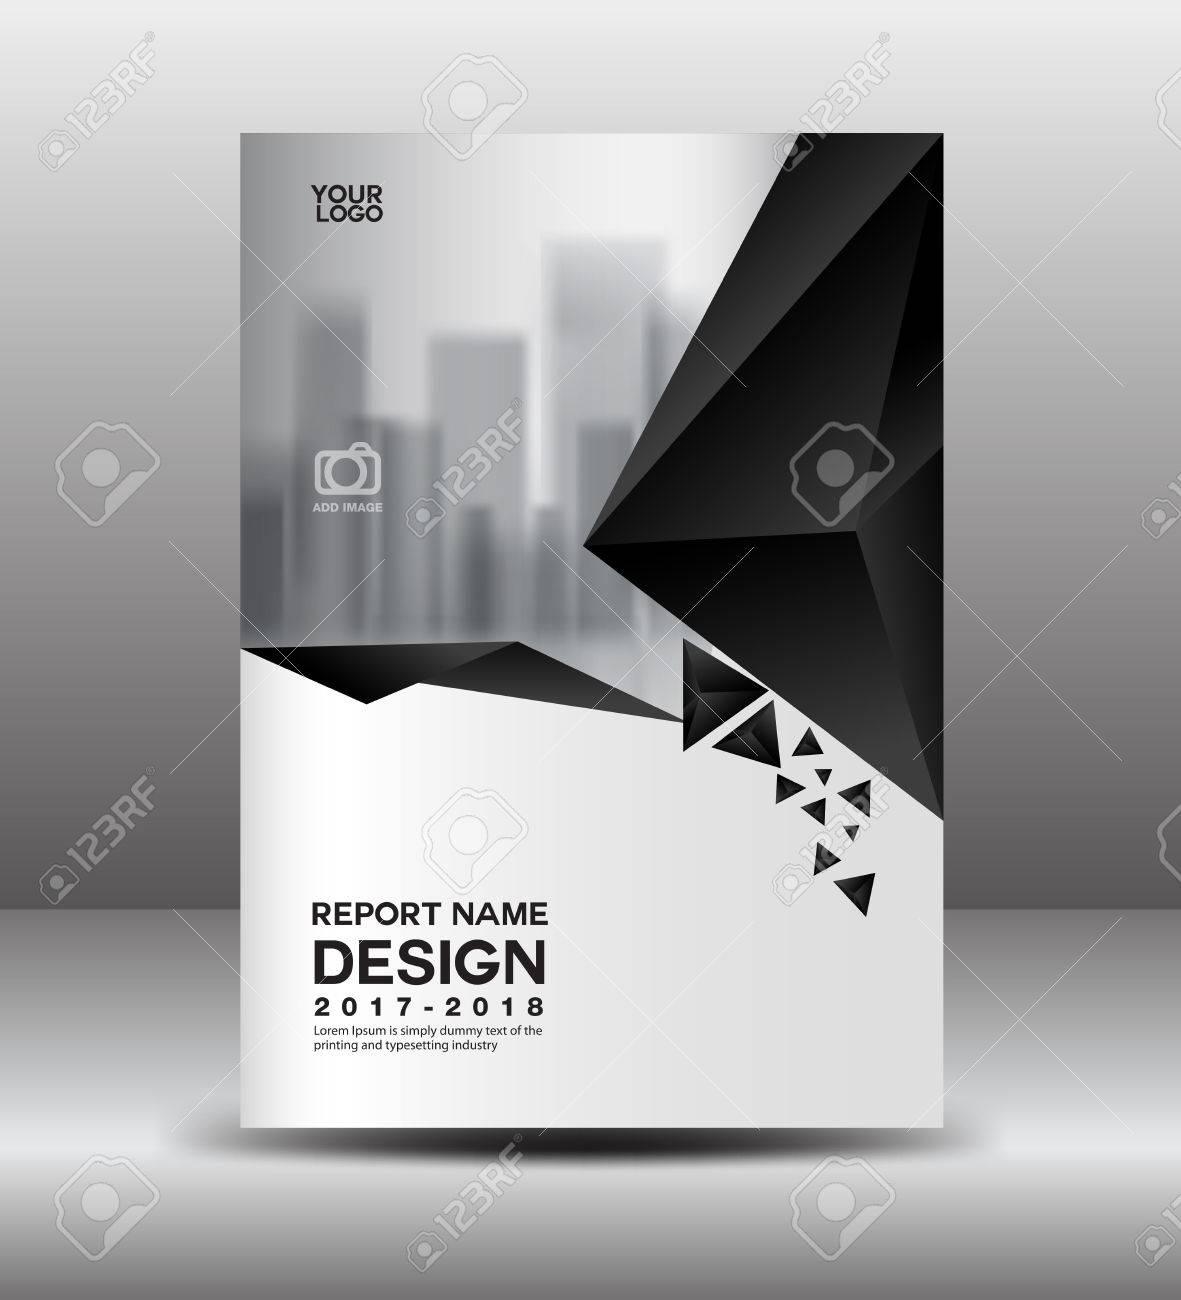 Cover Design Annual Report Vector Illustration Business Brochure